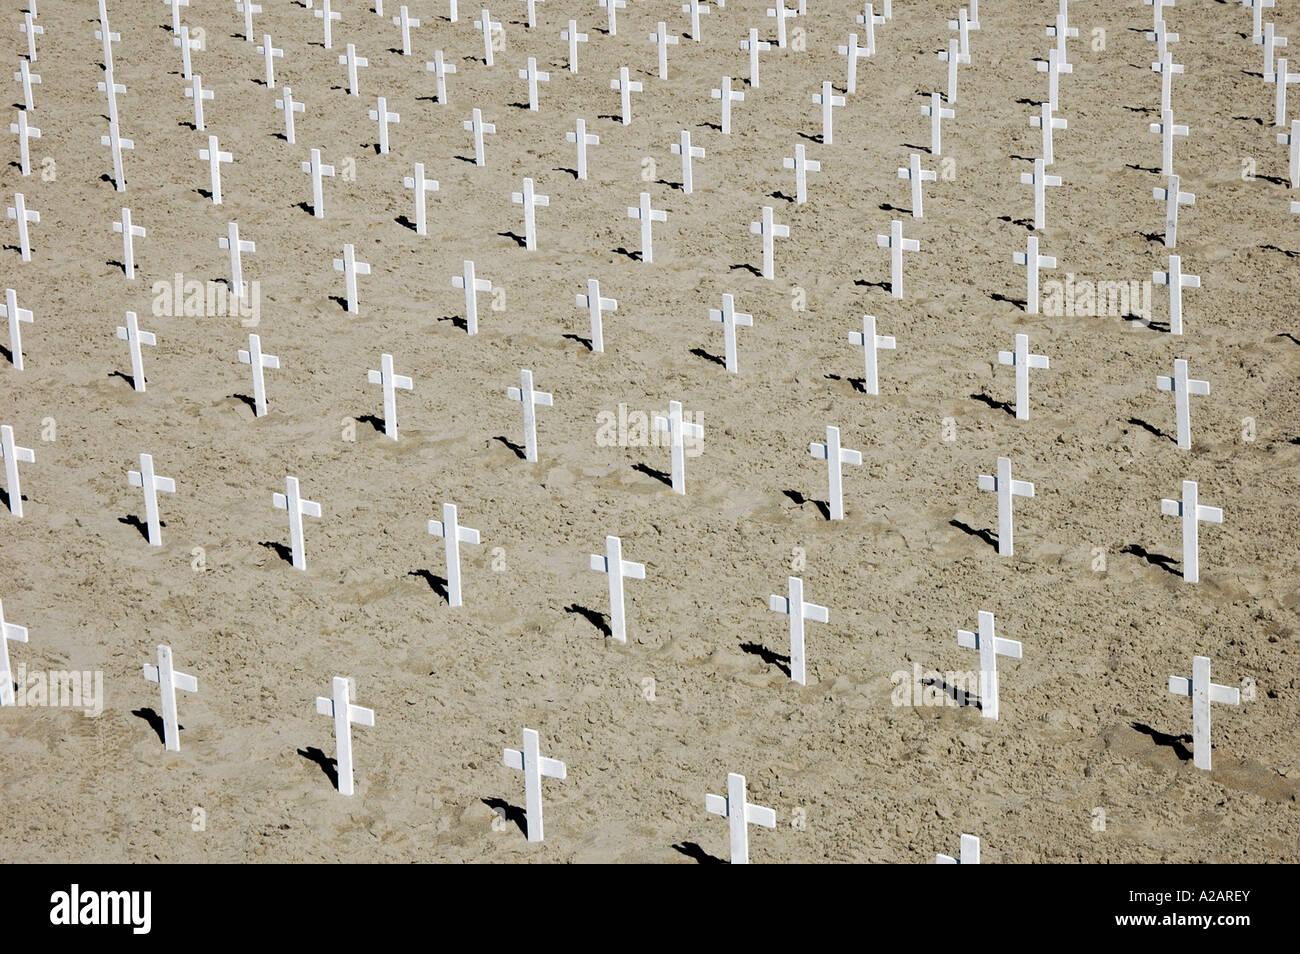 A sea of white crosses on Santa Monica beach, Los Angeles, California, USA. - Stock Image